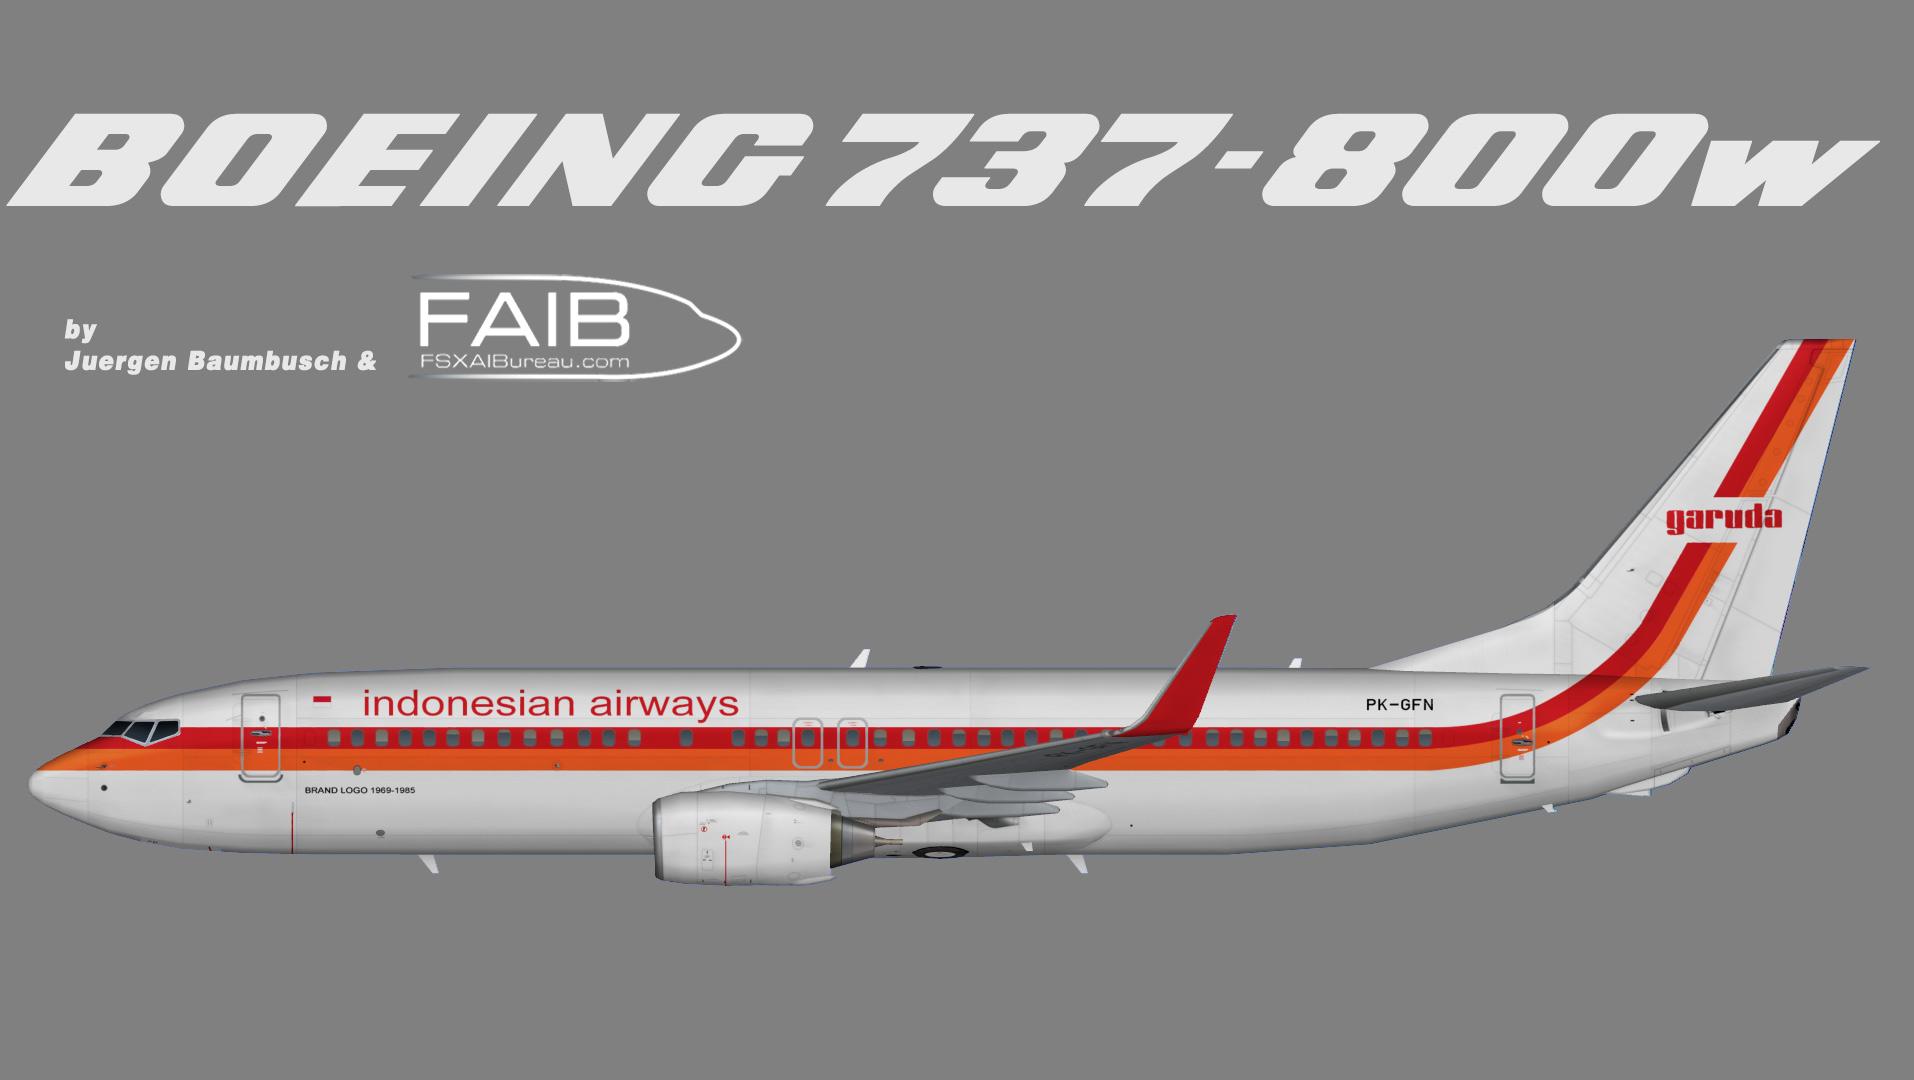 Garuda Indonesia Boeing 737-800w Retro Logojet 1969 – 1985